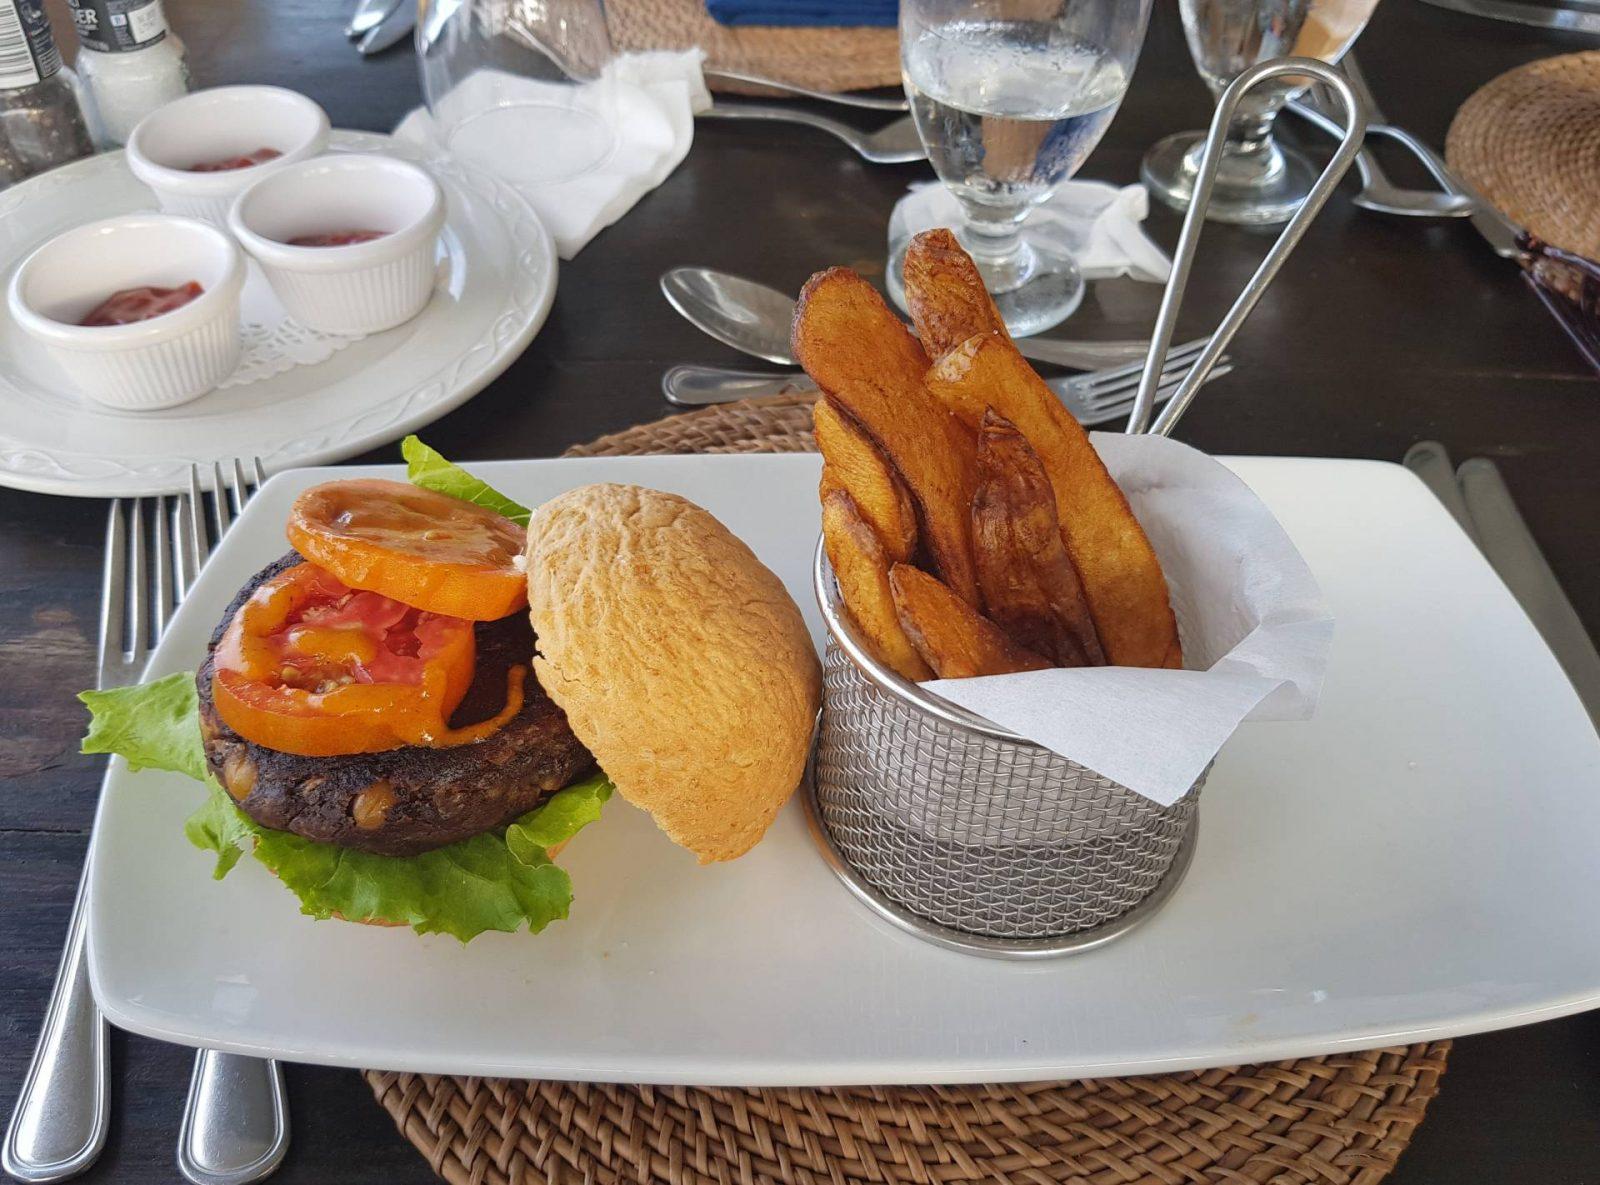 Miss Tunica leopard print kaftan and lunch at The Atlantis Historic Inn, vegan burger